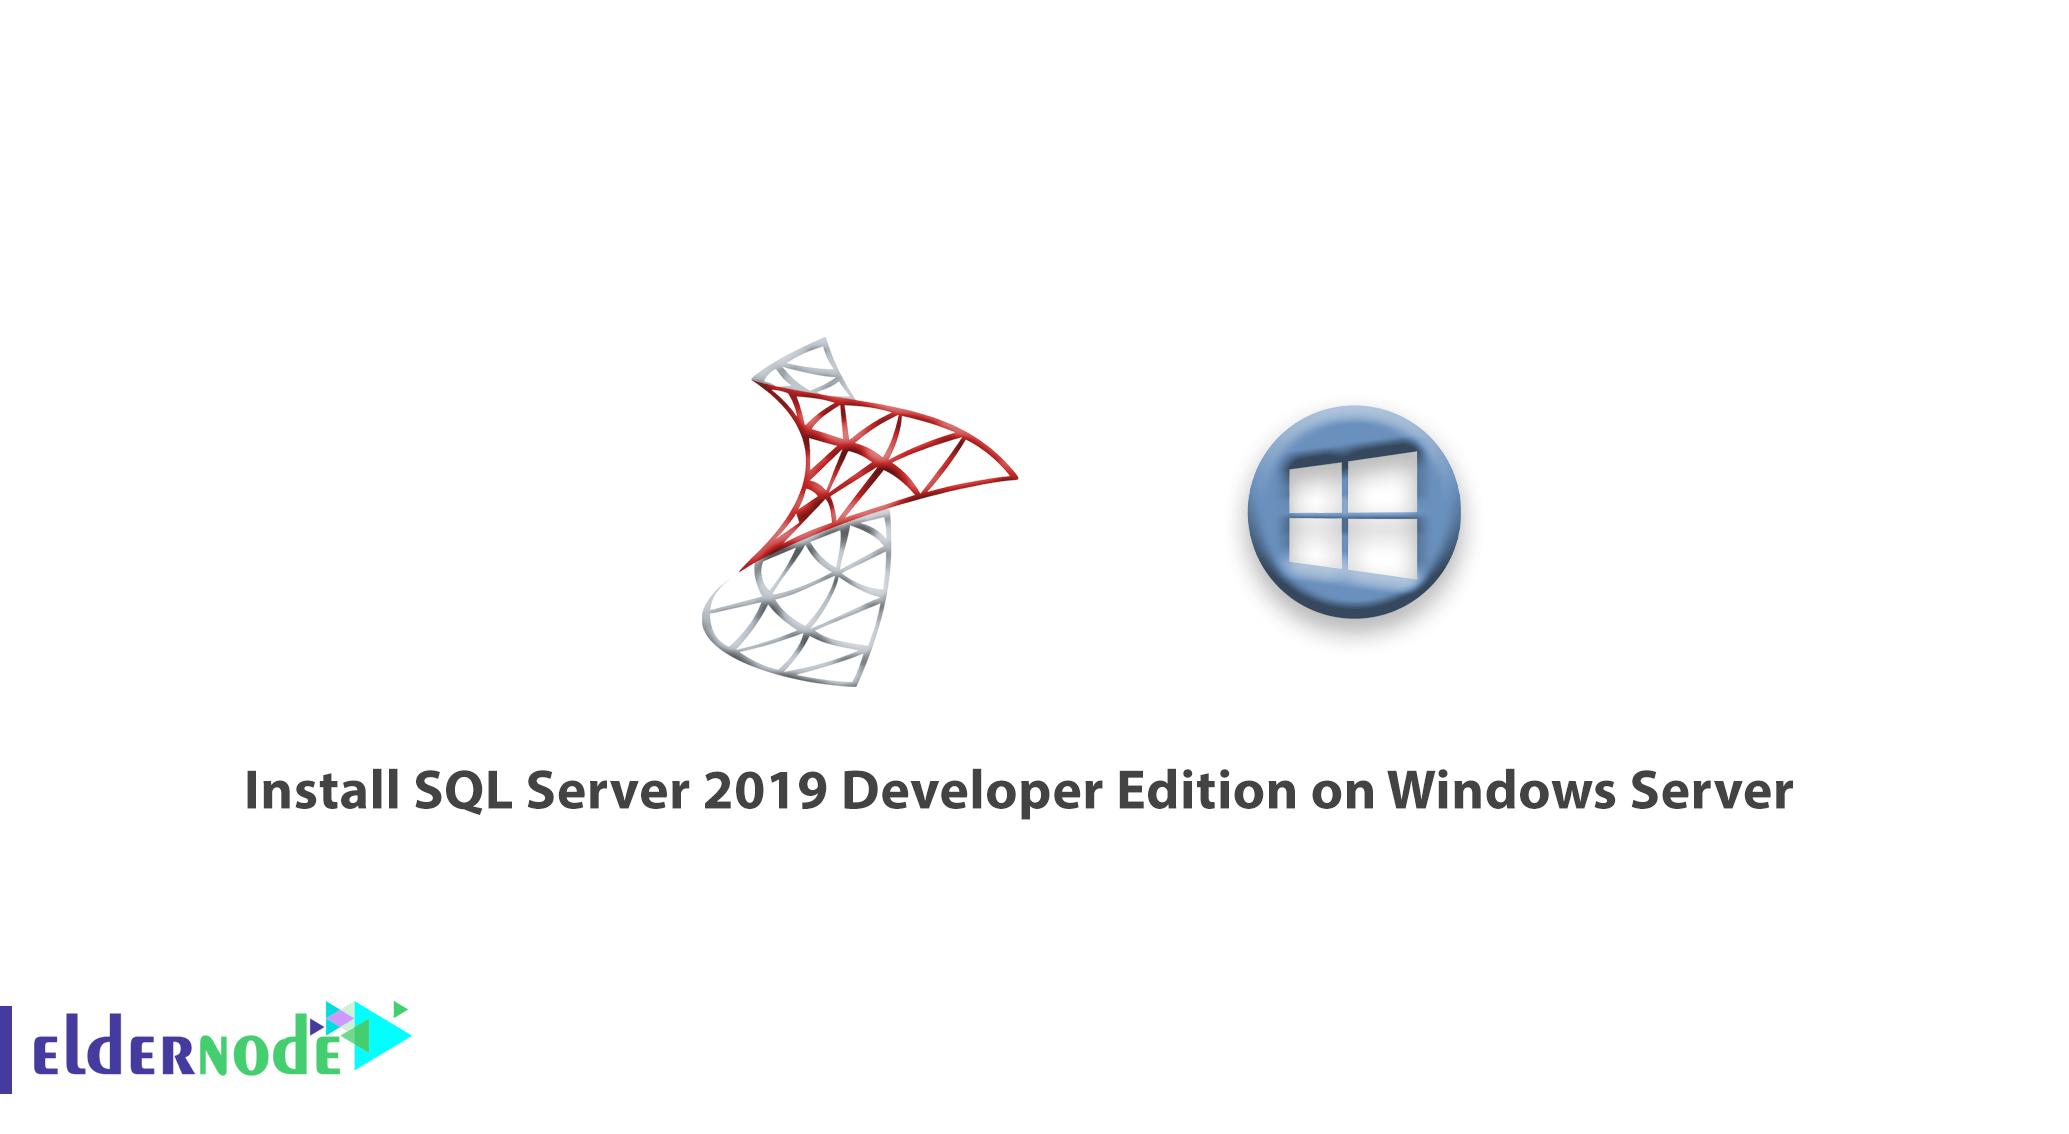 Tutorial Install SQL Server 2019 Developer Edition on Windows Server